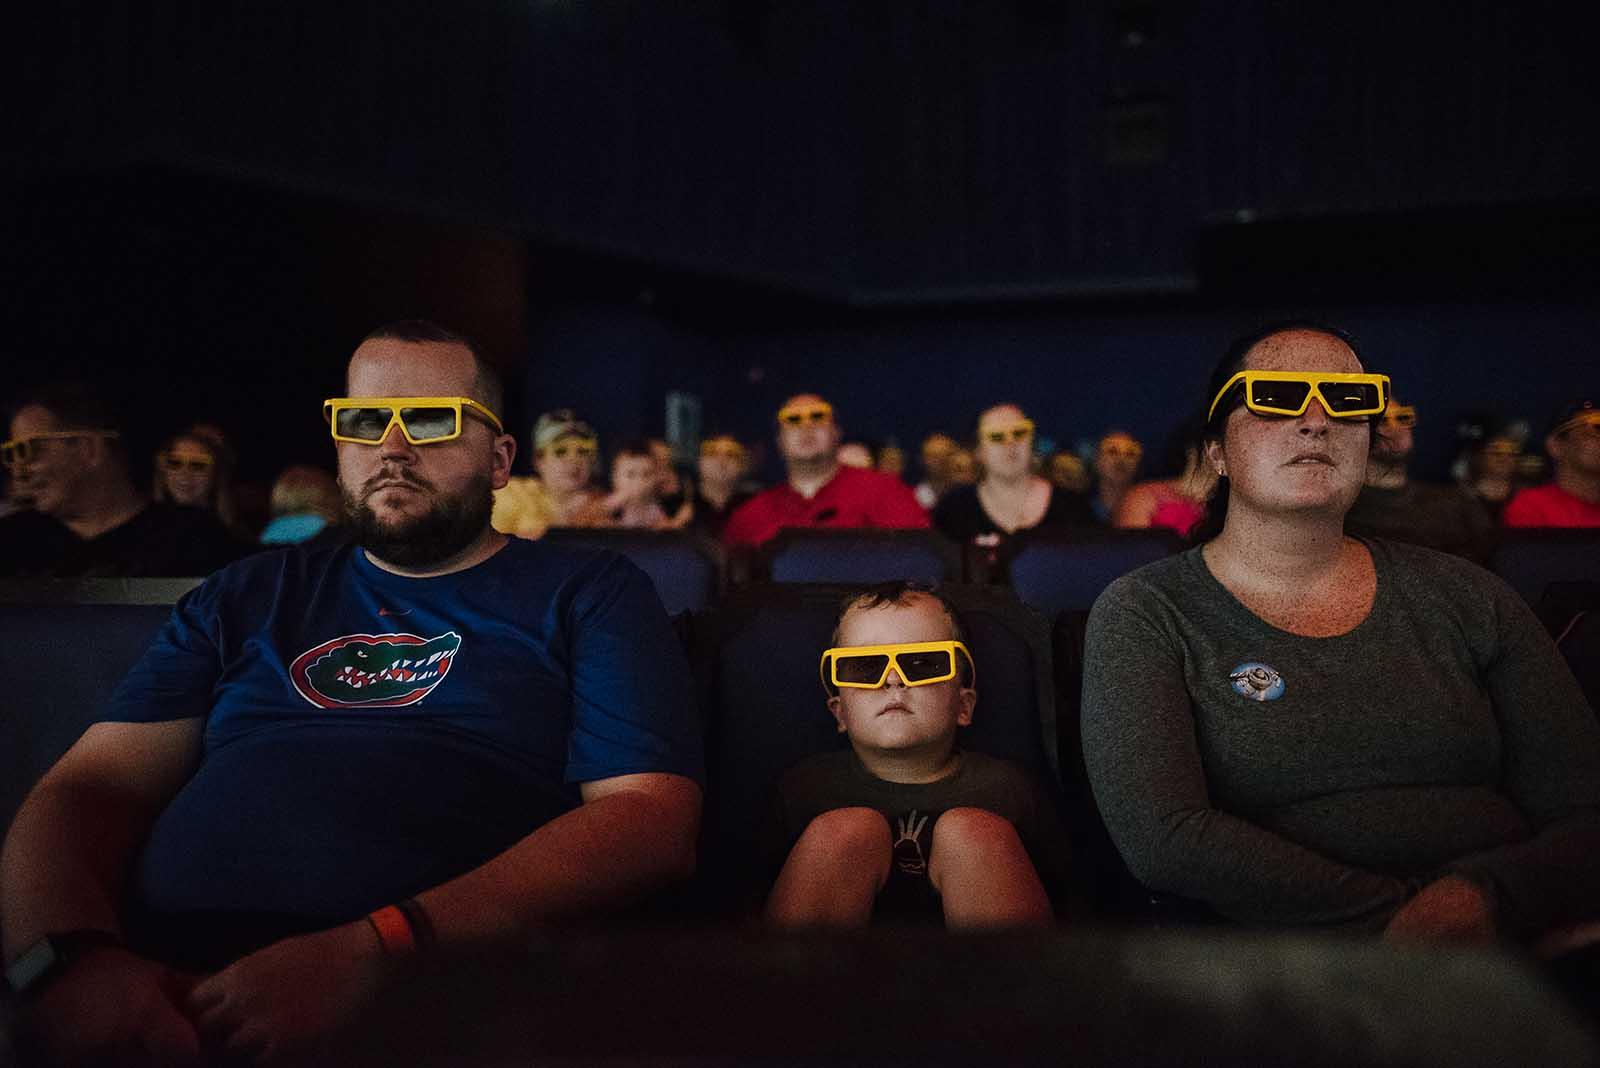 Disney photo of family in 3d glasses, Disney photo tips on available light